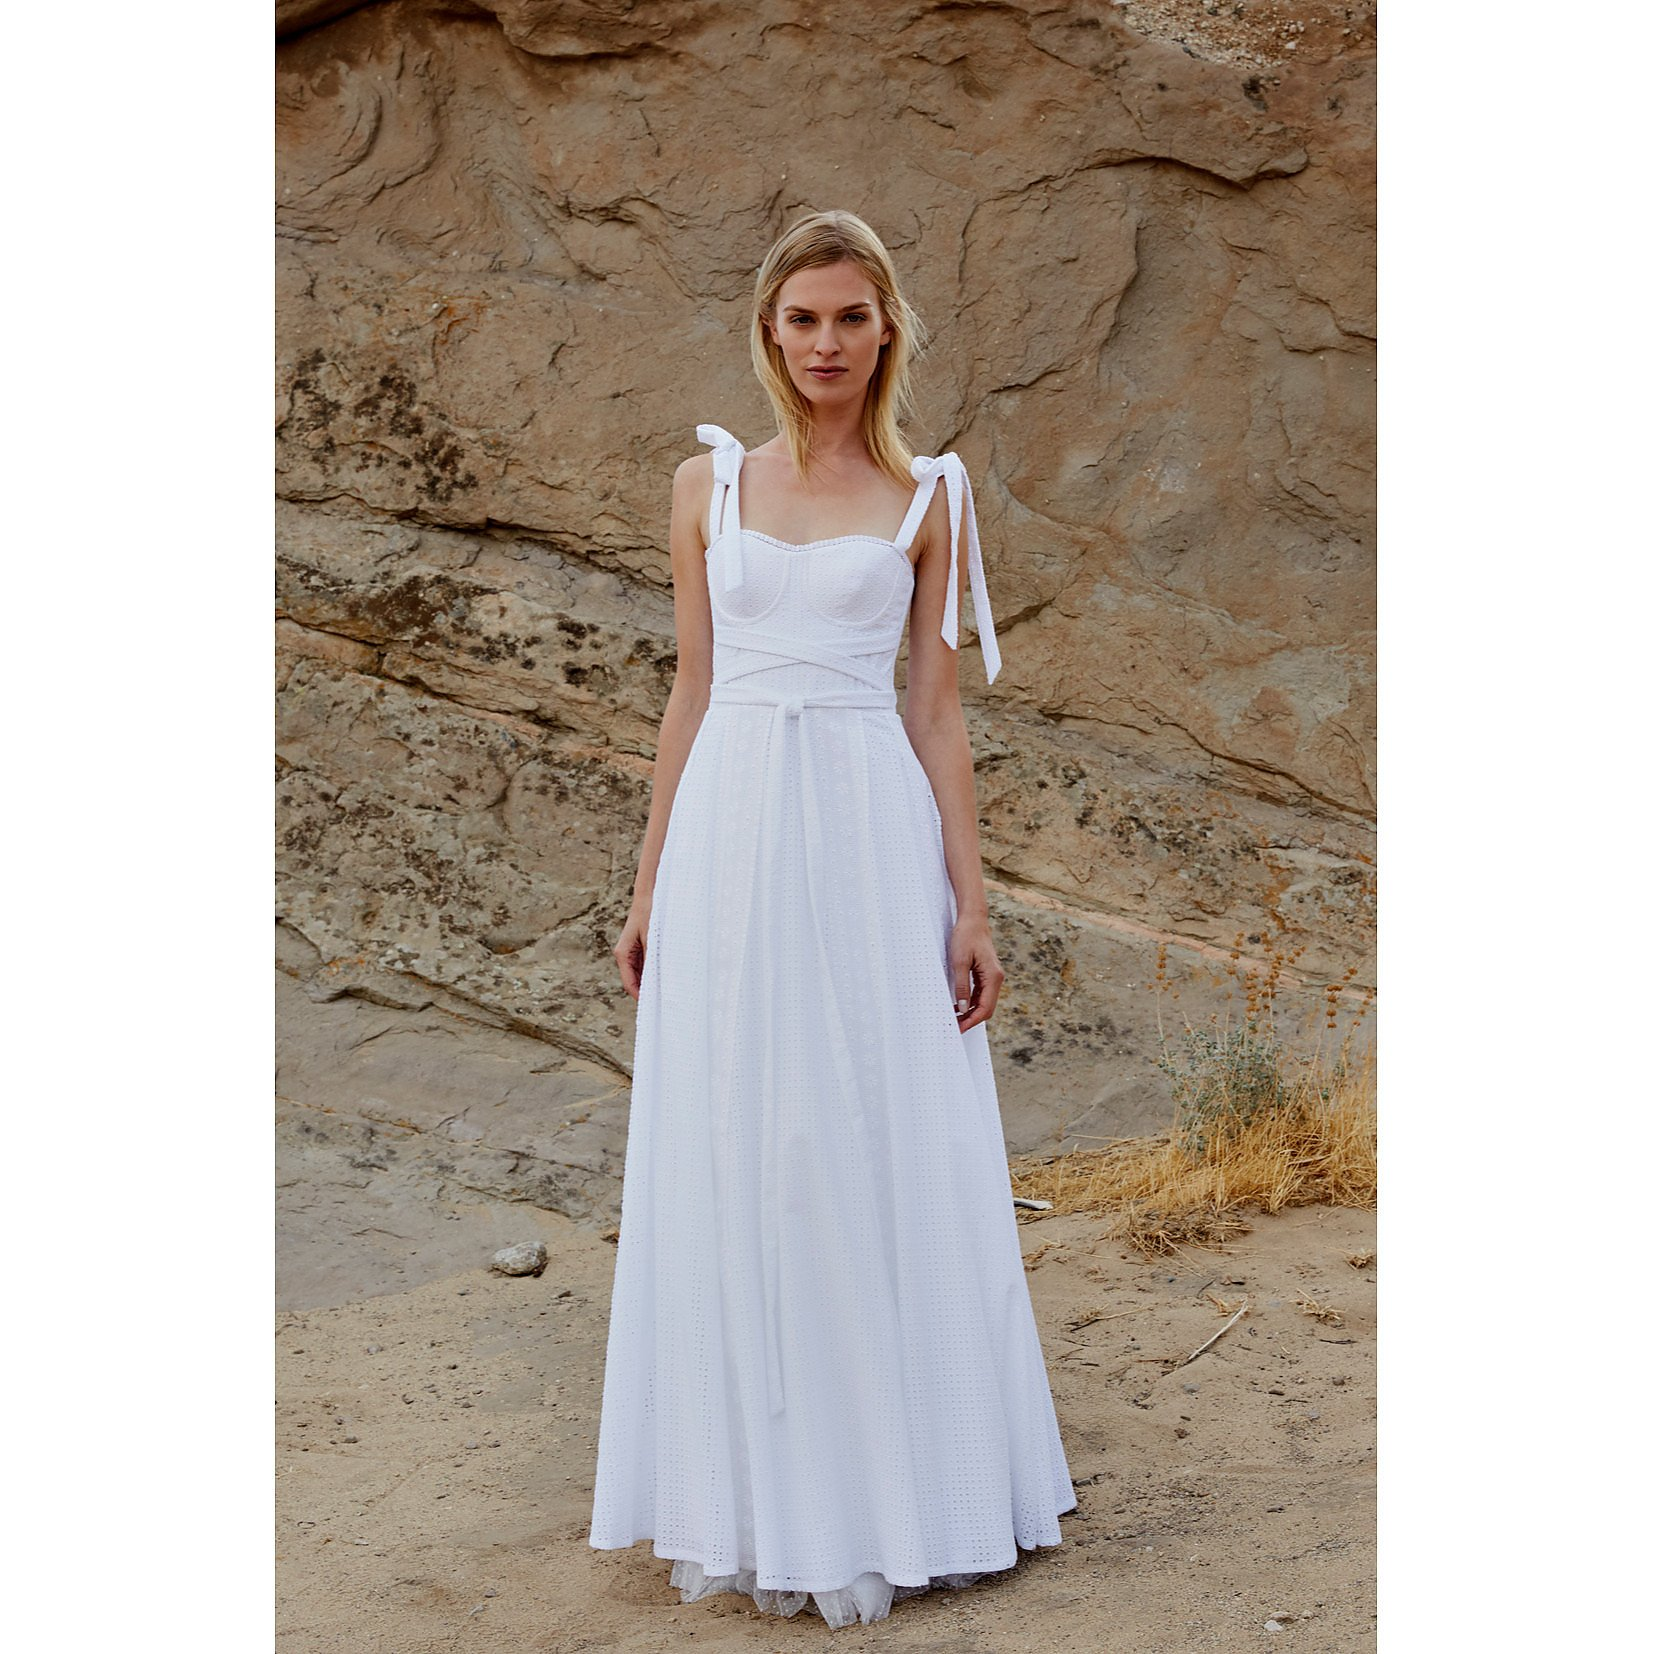 Savannah Miller Poppy Bridal Dress